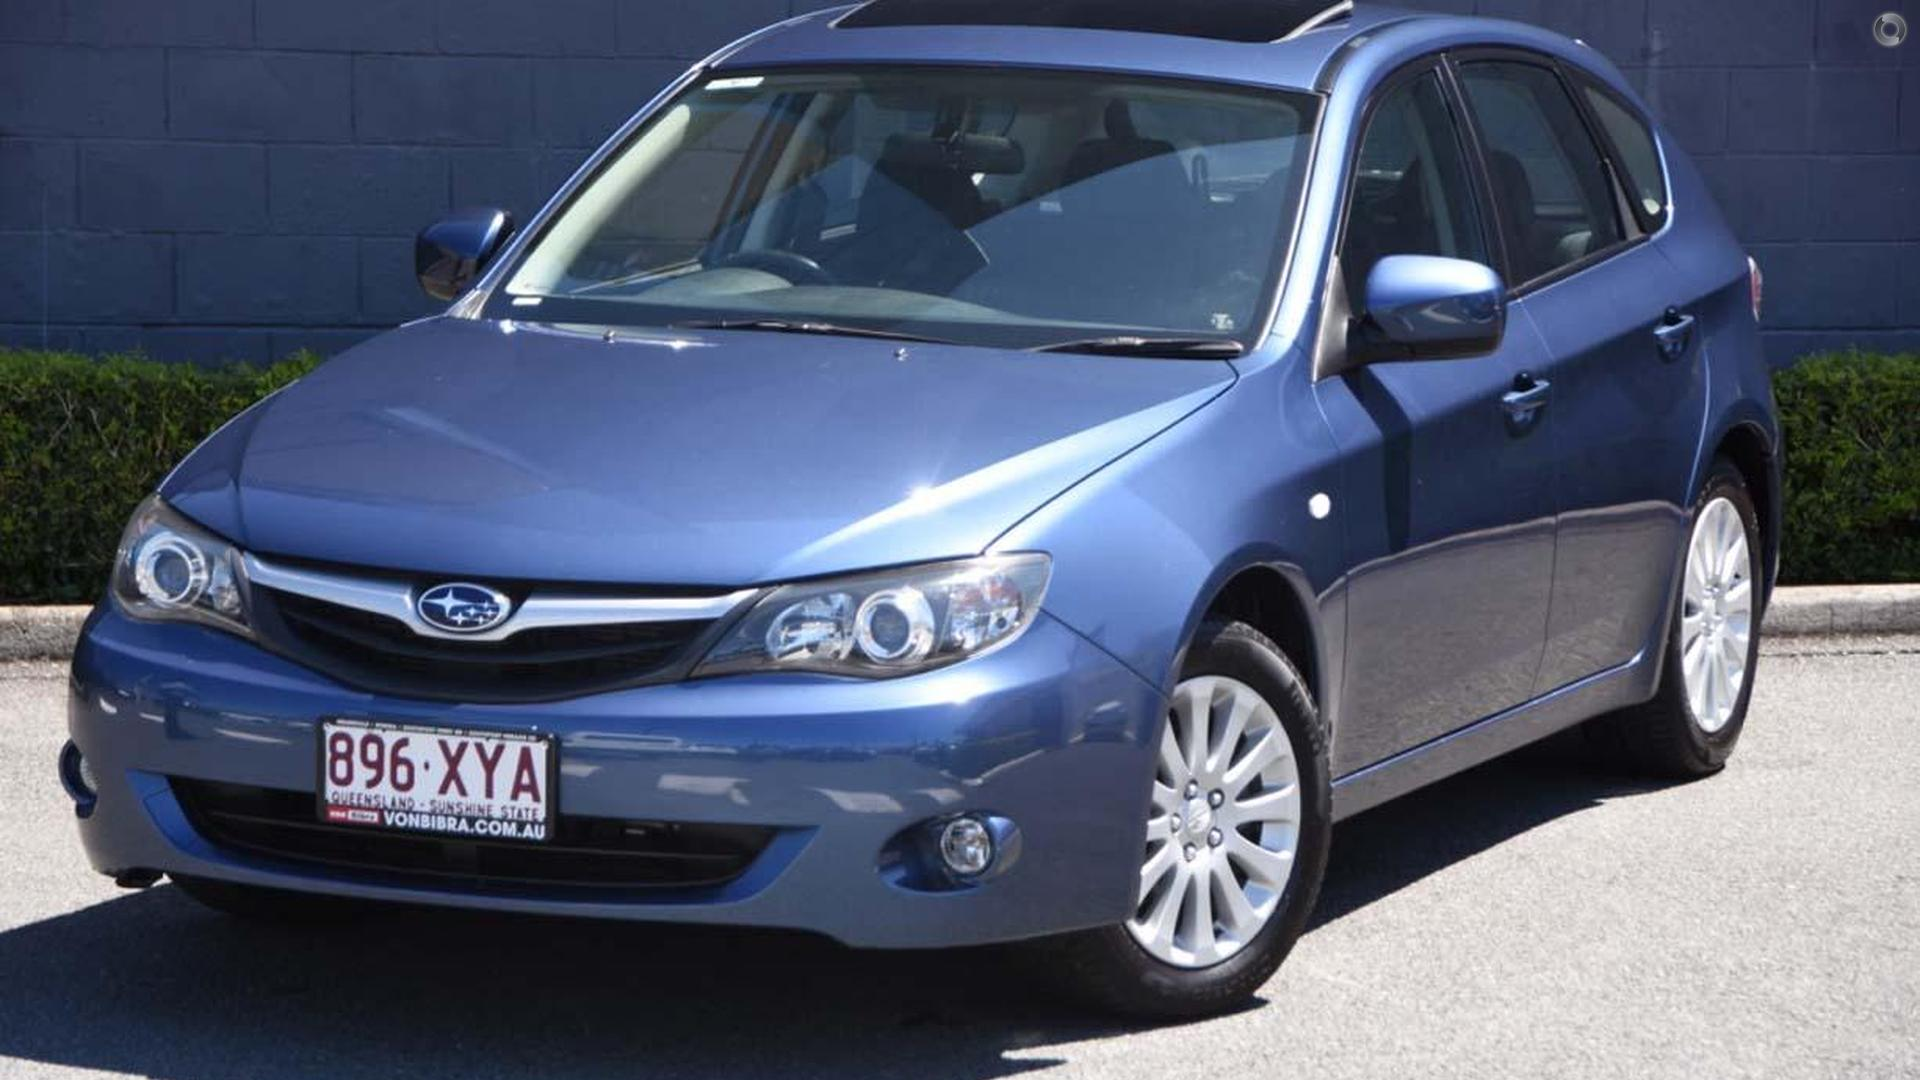 2010 Subaru Impreza G3